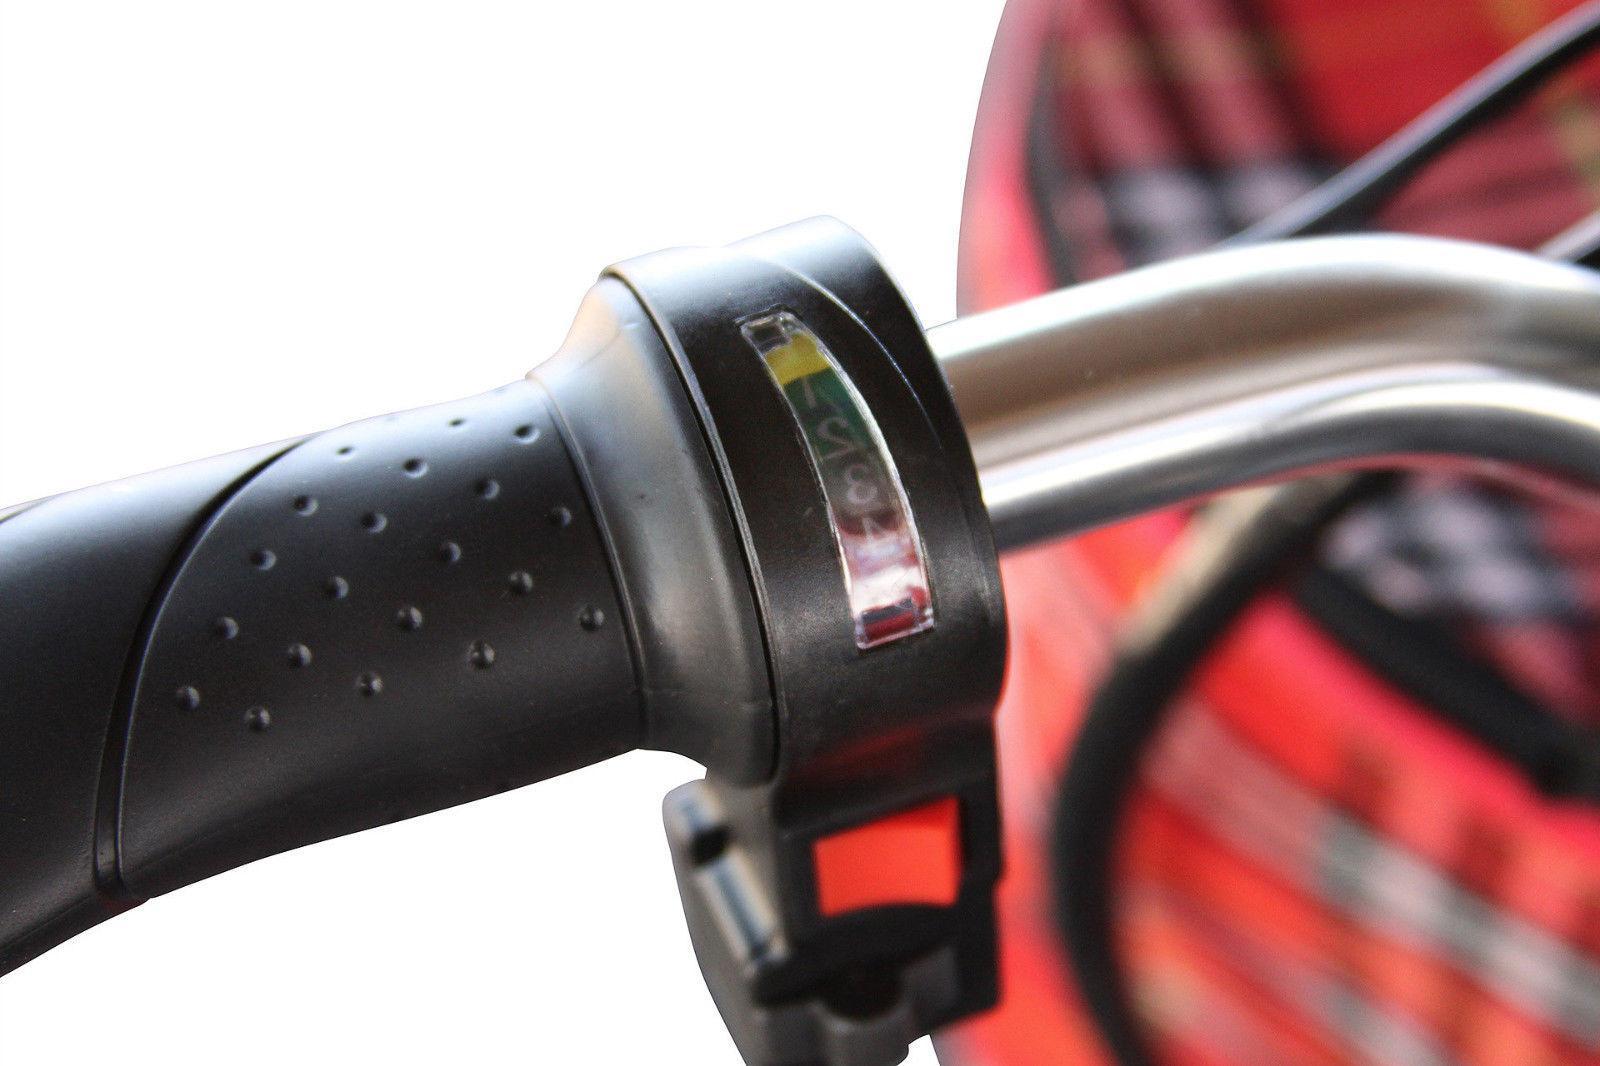 eWheels Stand-N-Ride Mobility 300lbs 15mph - No